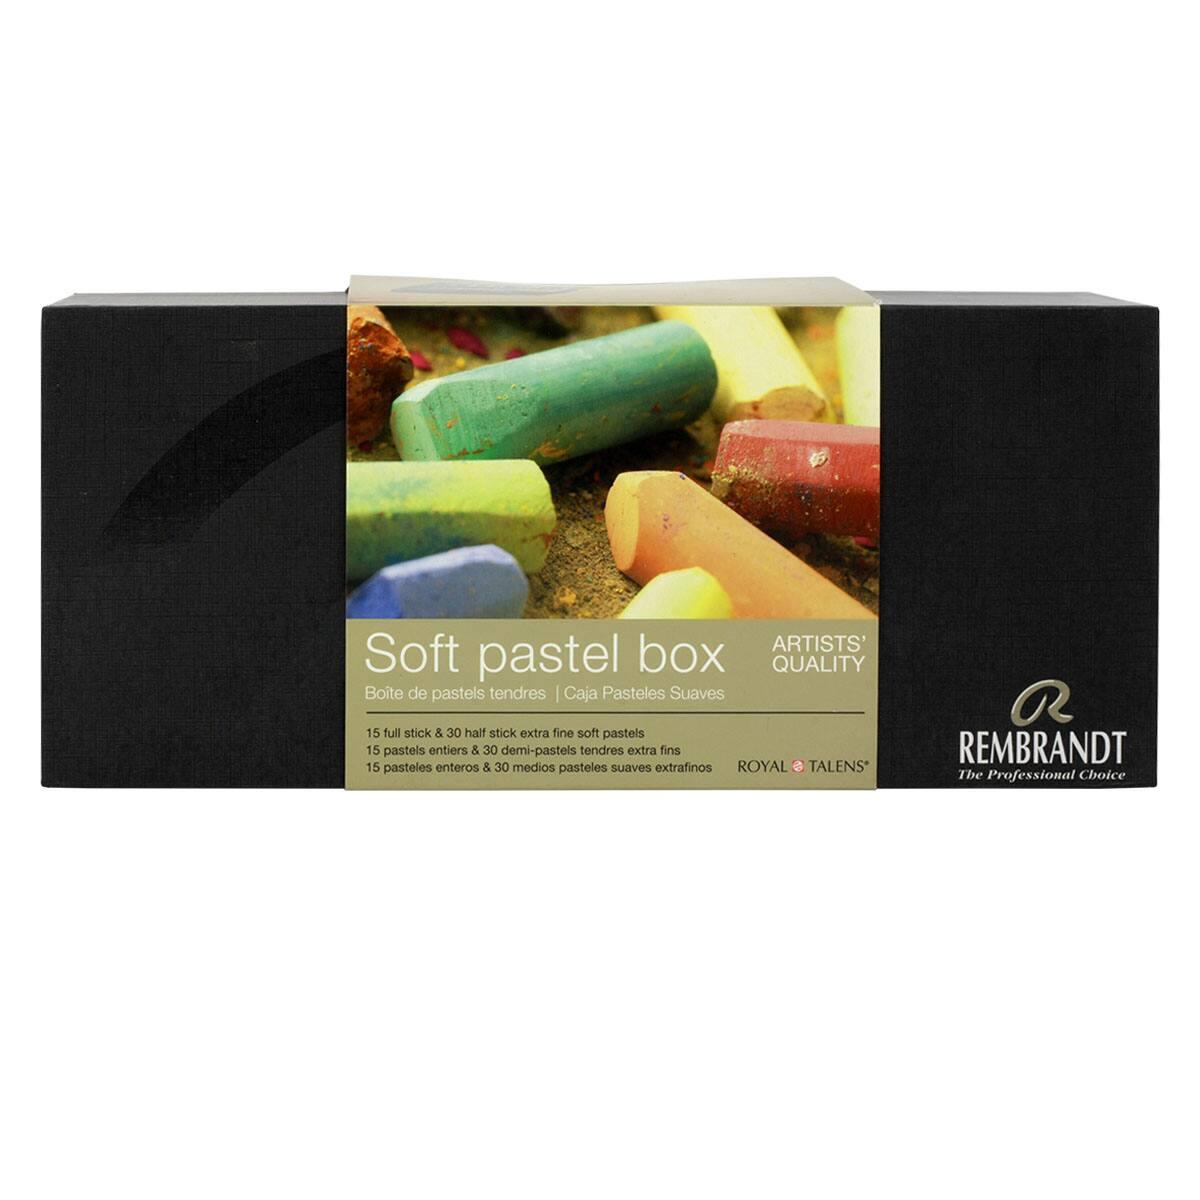 Rembrandt 30 Artists Soft Demi Pastel Box Set Professional Artists Pastels